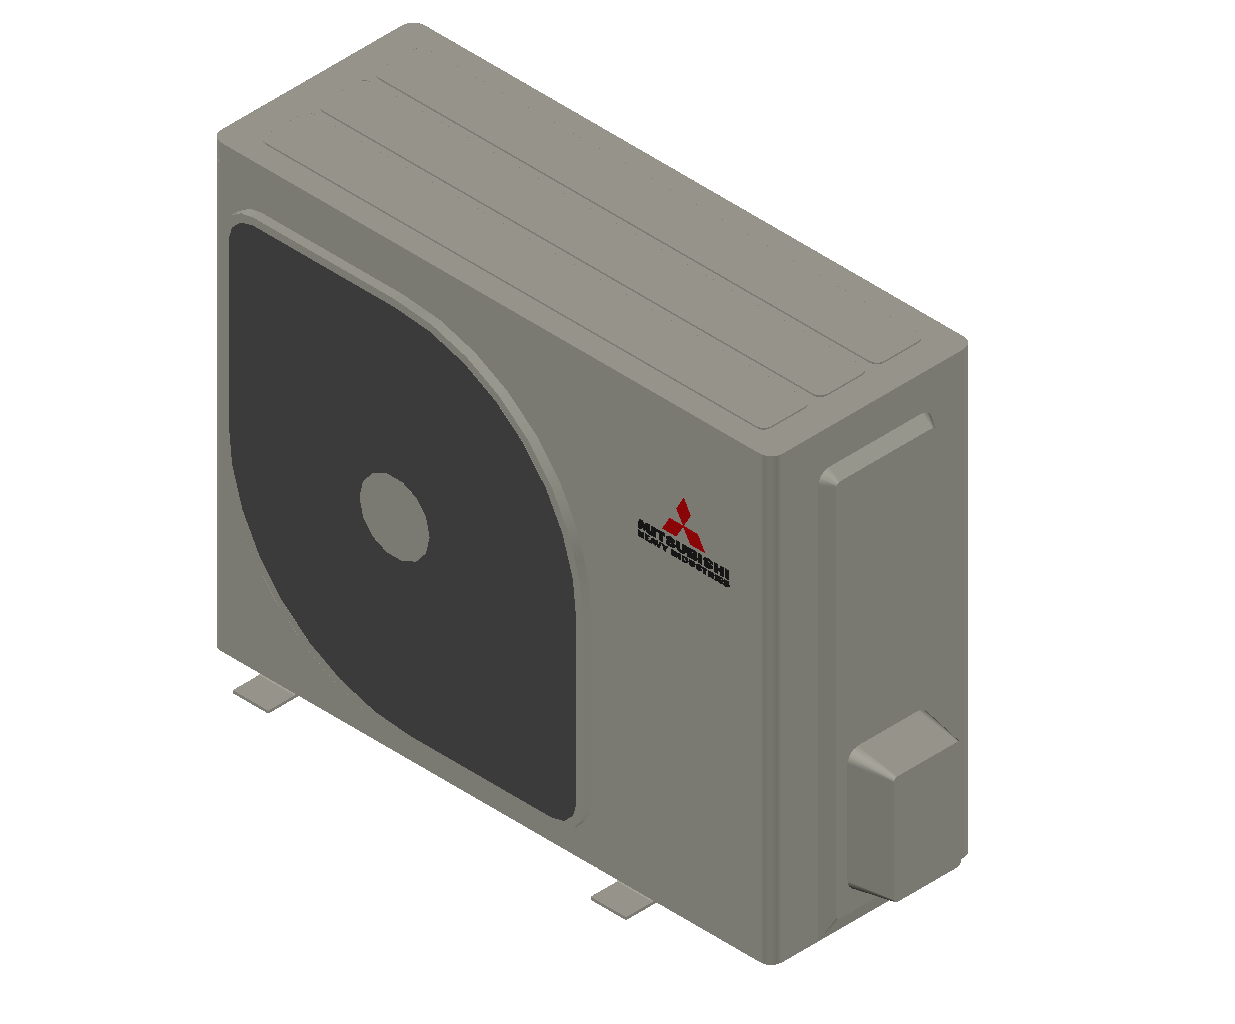 HC_Heat Pump_MEPcontent_Mitsubishi Heavy Industries_PAC-RAC_SRC25ZSX-S_INT-EN.dwg